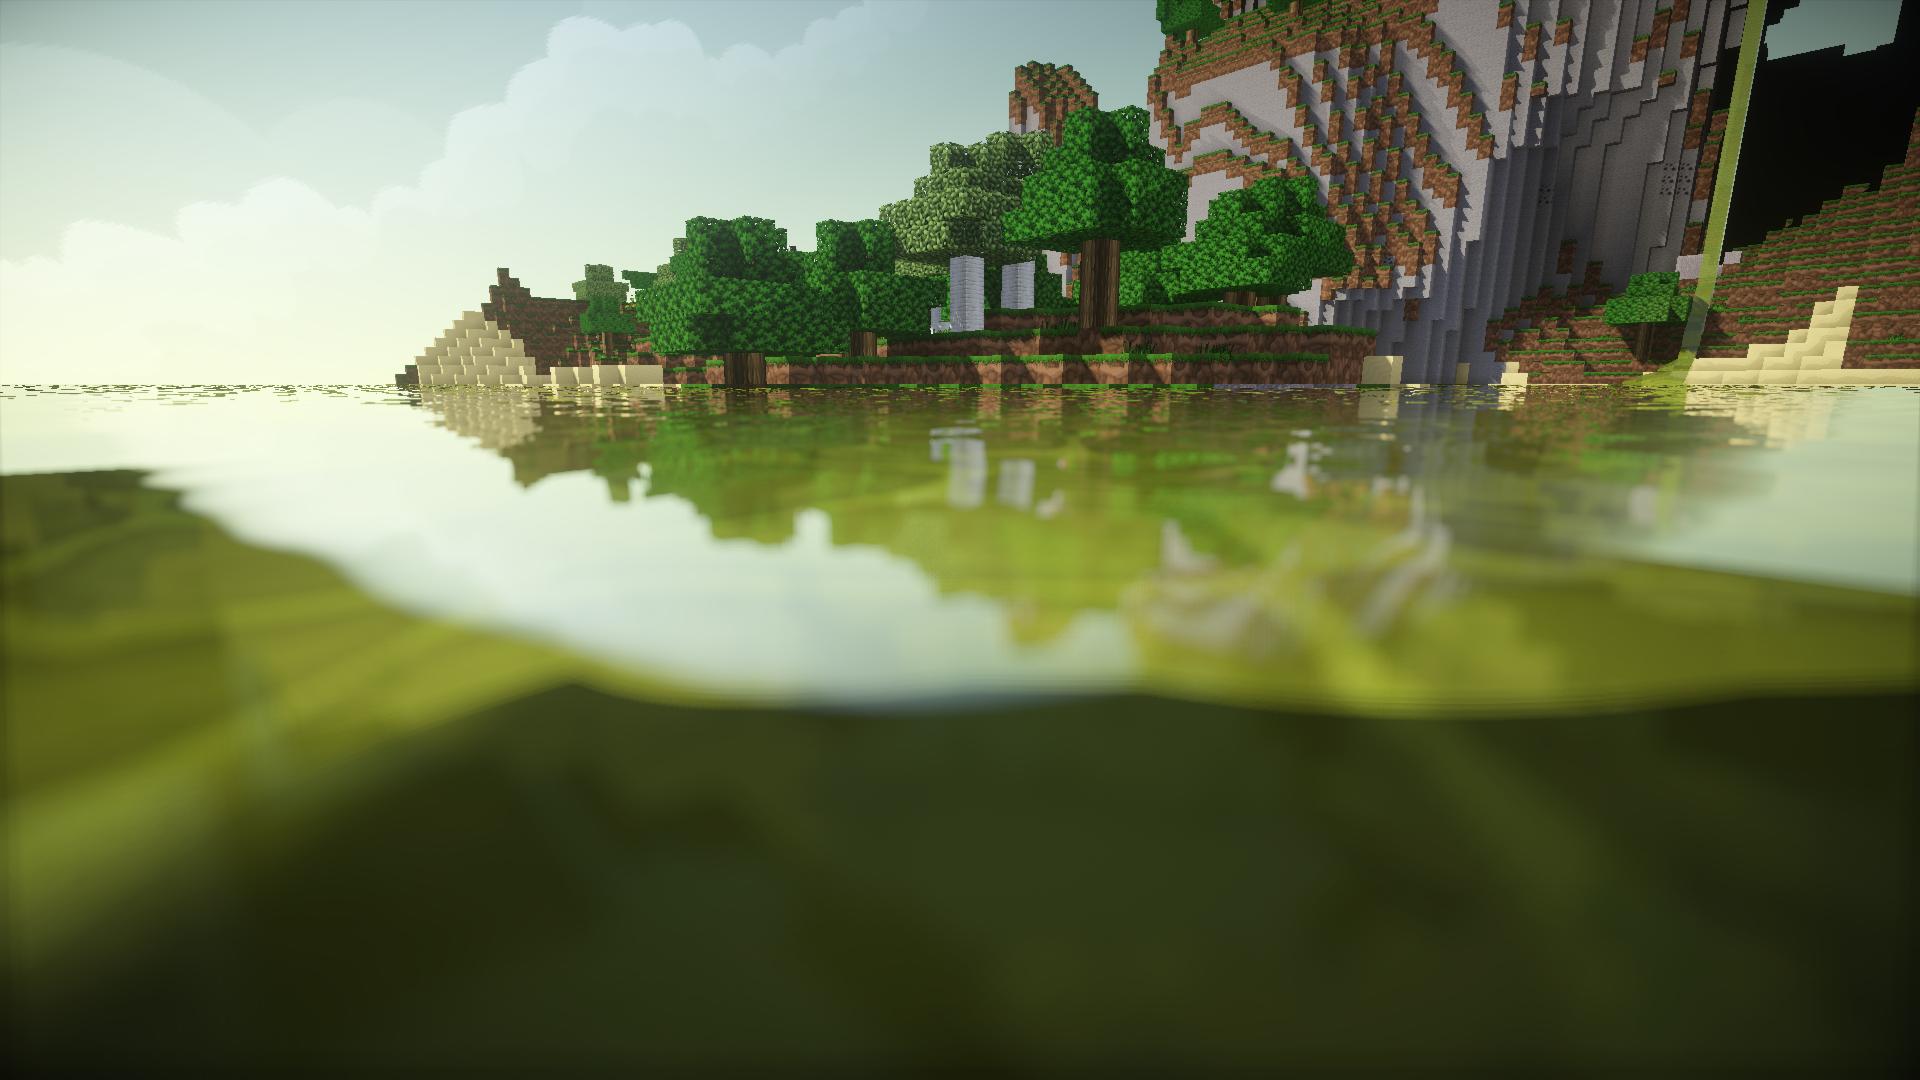 Fond d'écran Minecraft : Minecraft-aventure.com - Fond D'ecran Minecraft